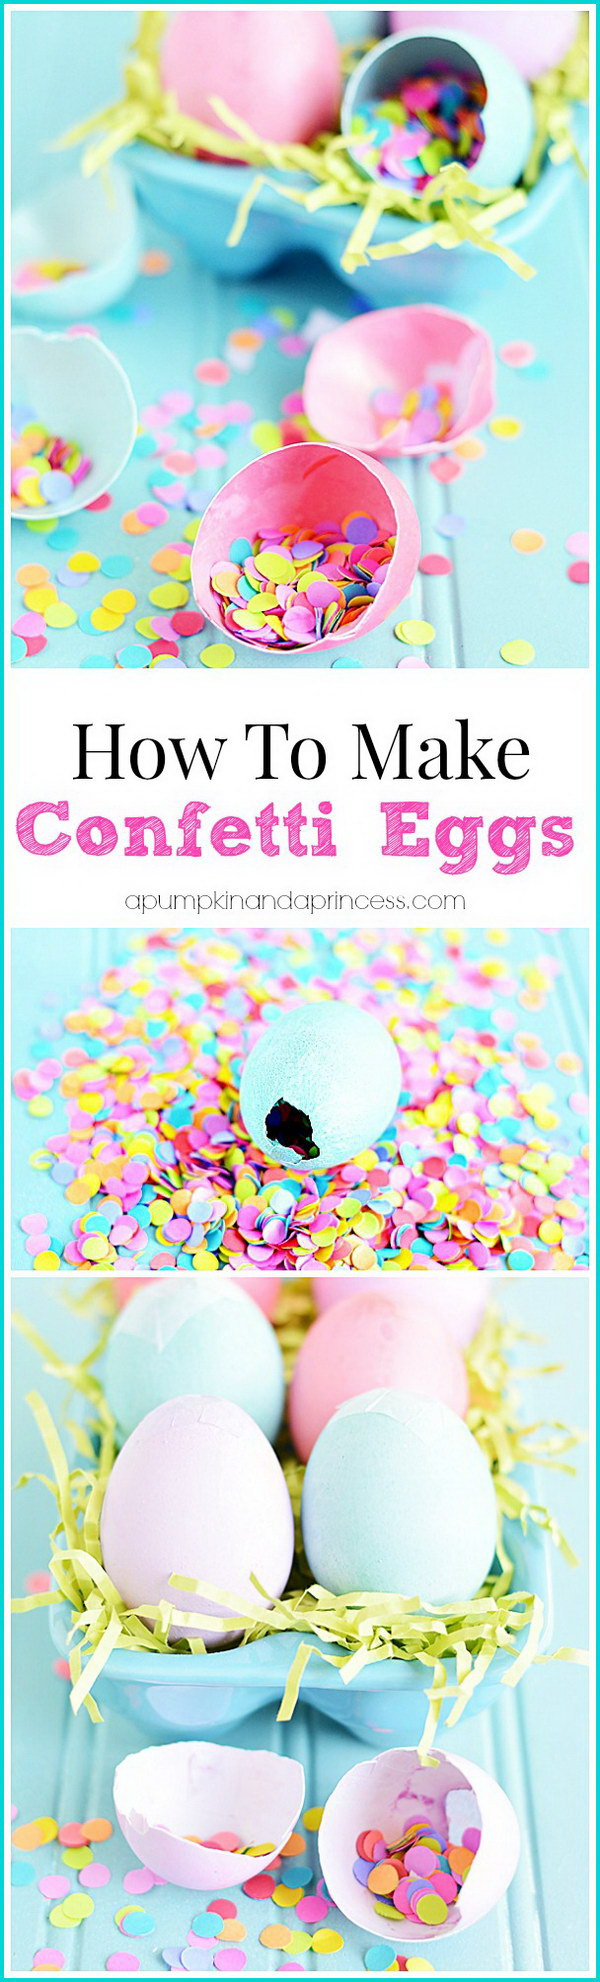 17 DIY Confetti Easter Eggs